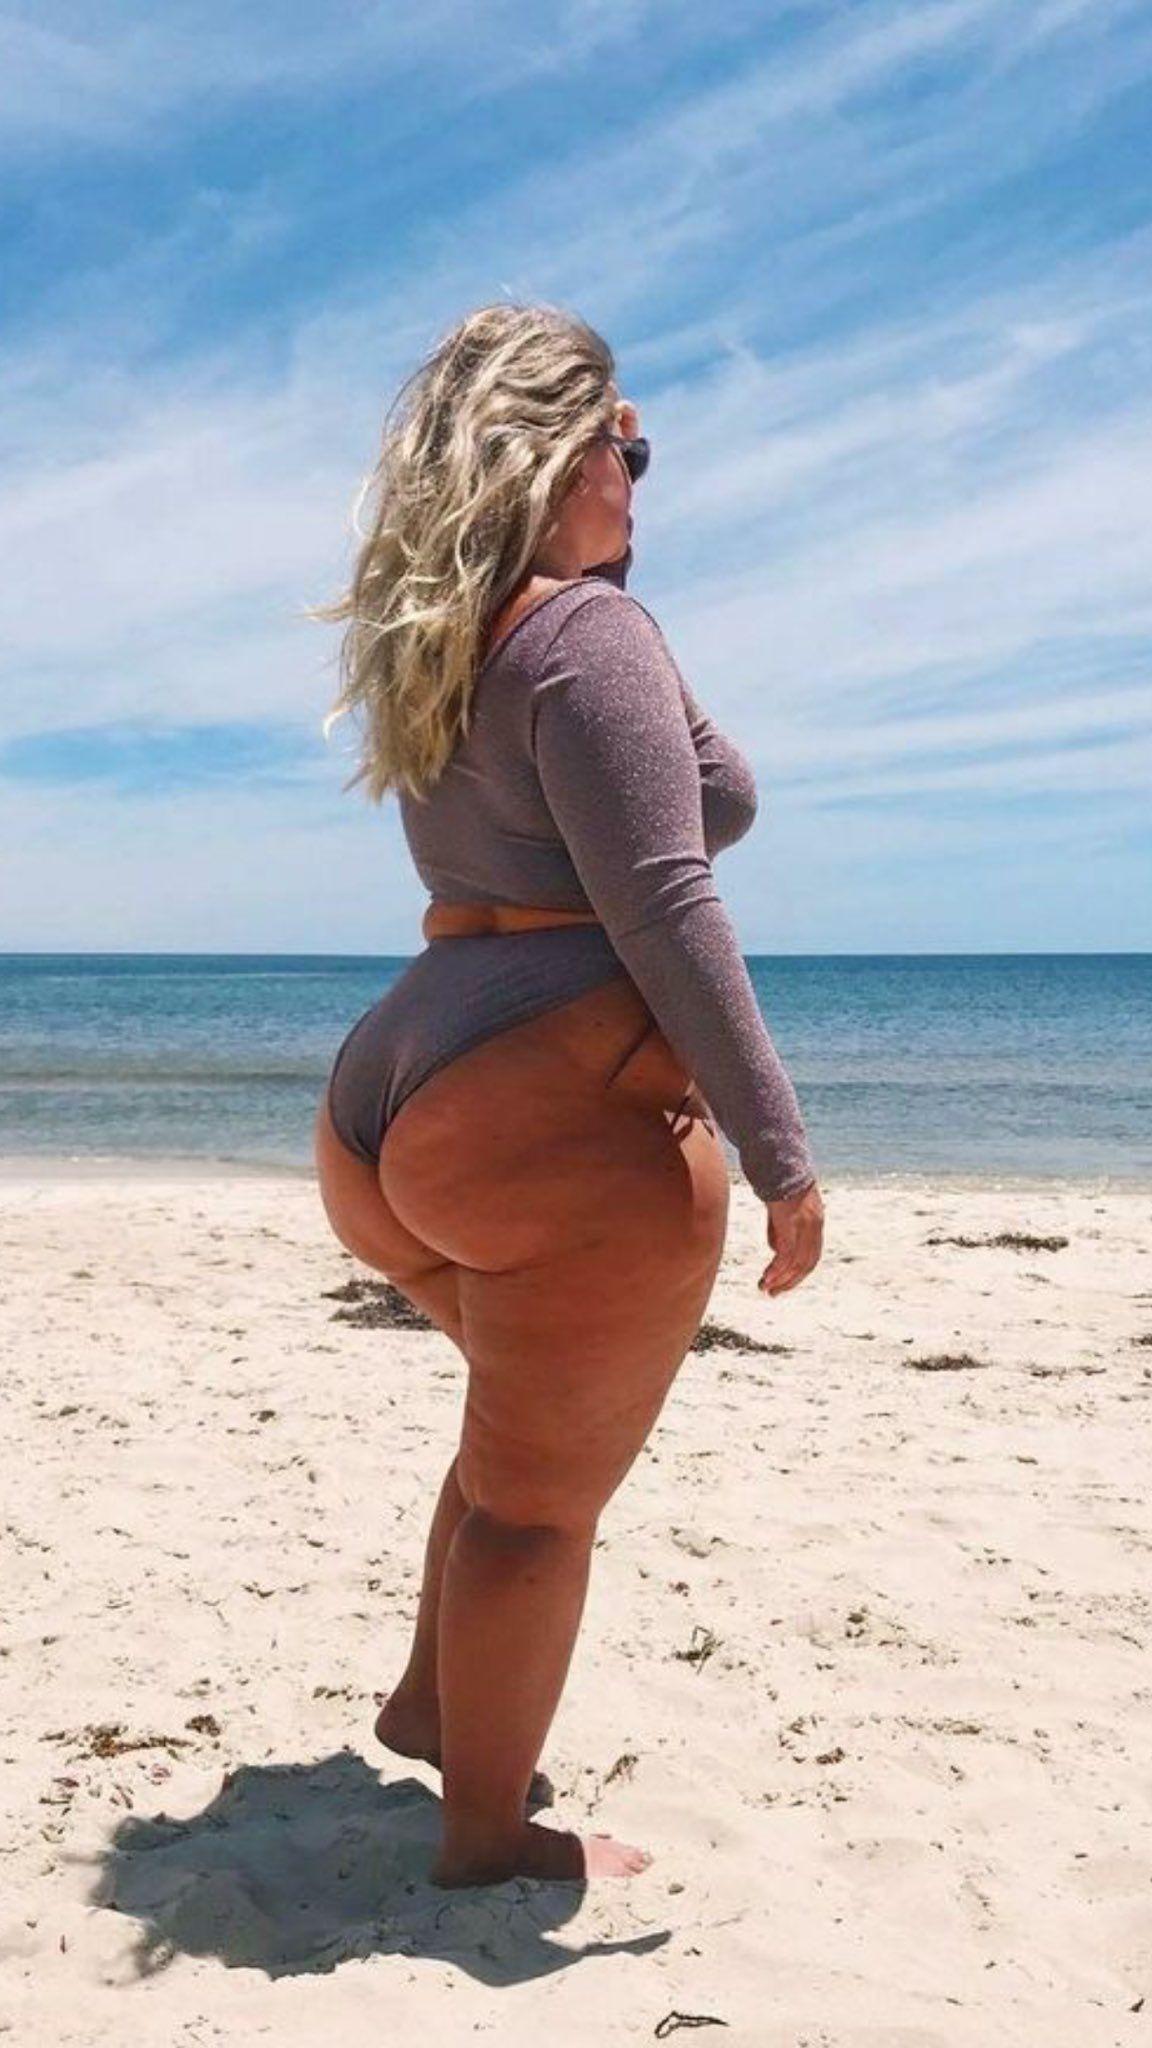 Bbw Mature Booty badfeet | full figure women. in 2018 | pinterest | curvy